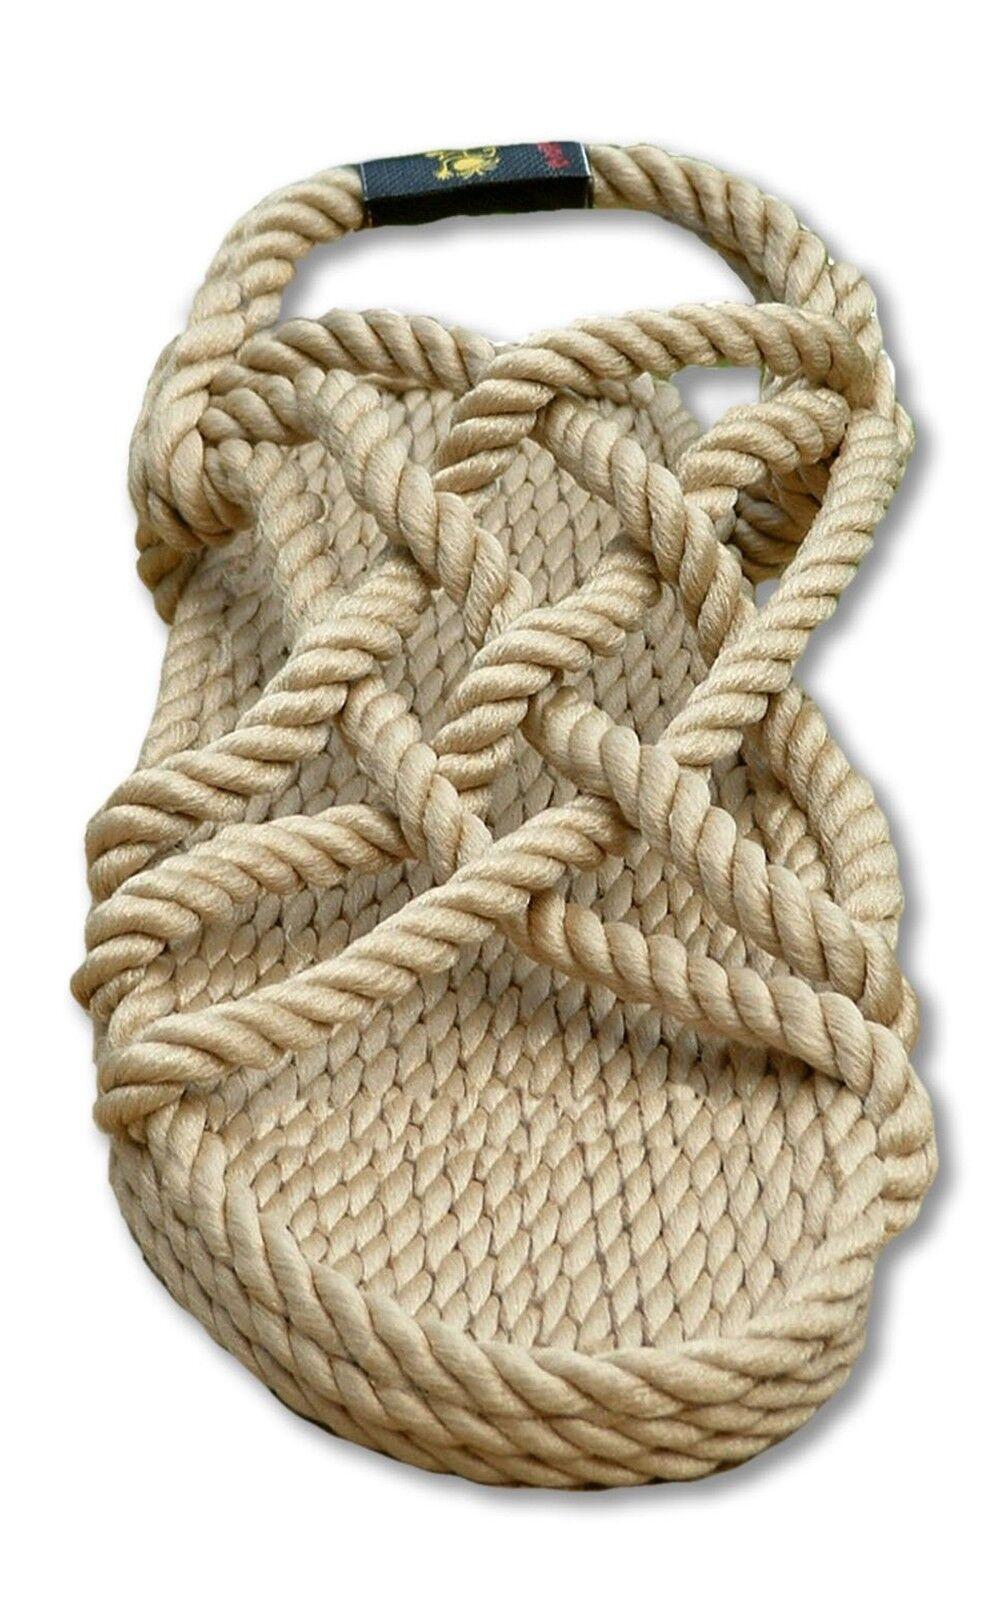 Sandali e scarpe per il mare da uomo Nomadic State of Mind JC Sandal Camel 44 (M 12-12.5)